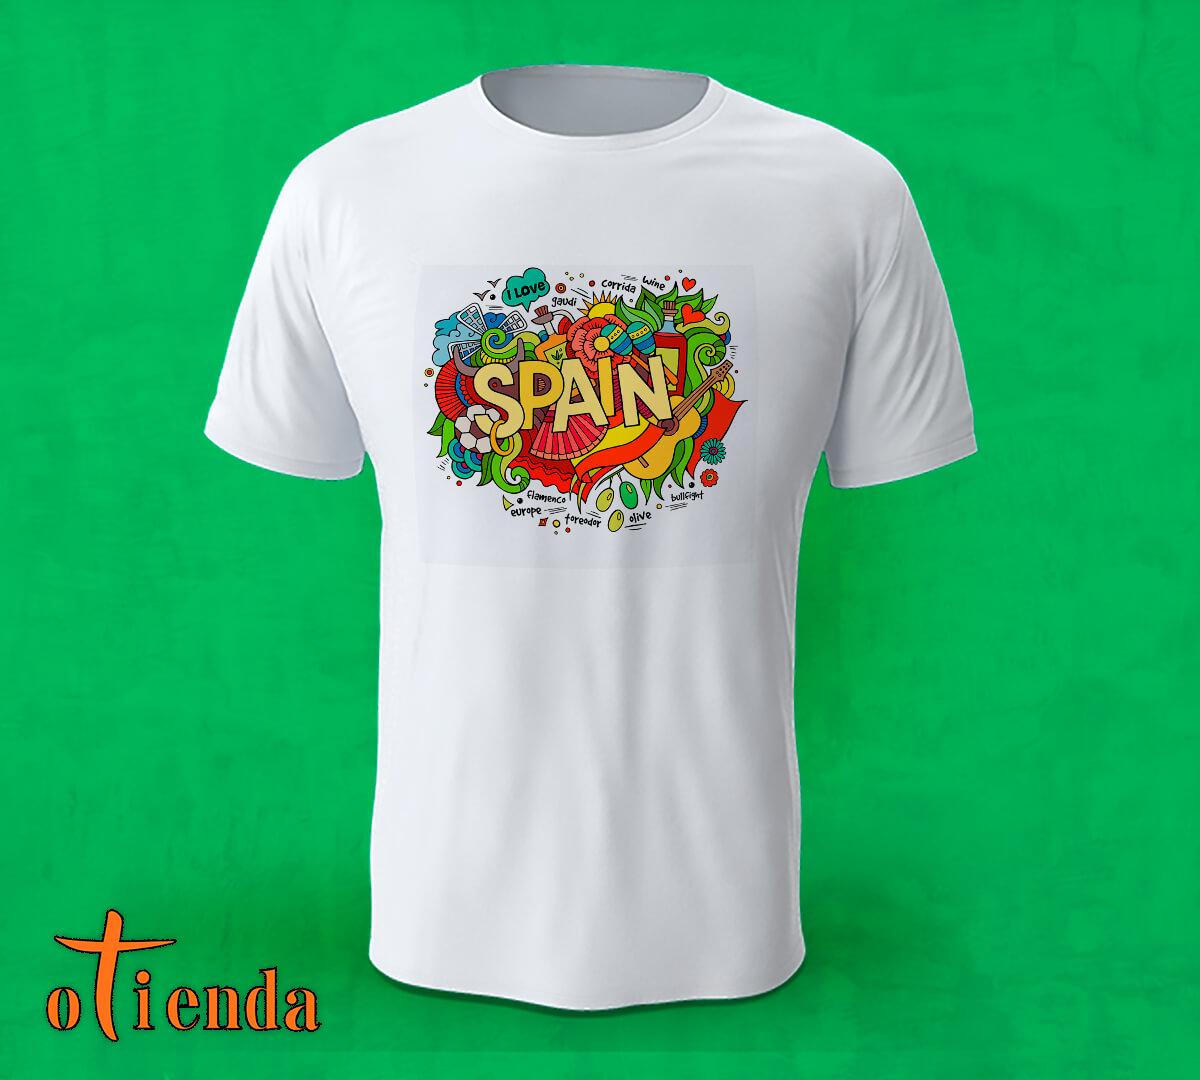 Camiseta Spain personalizada